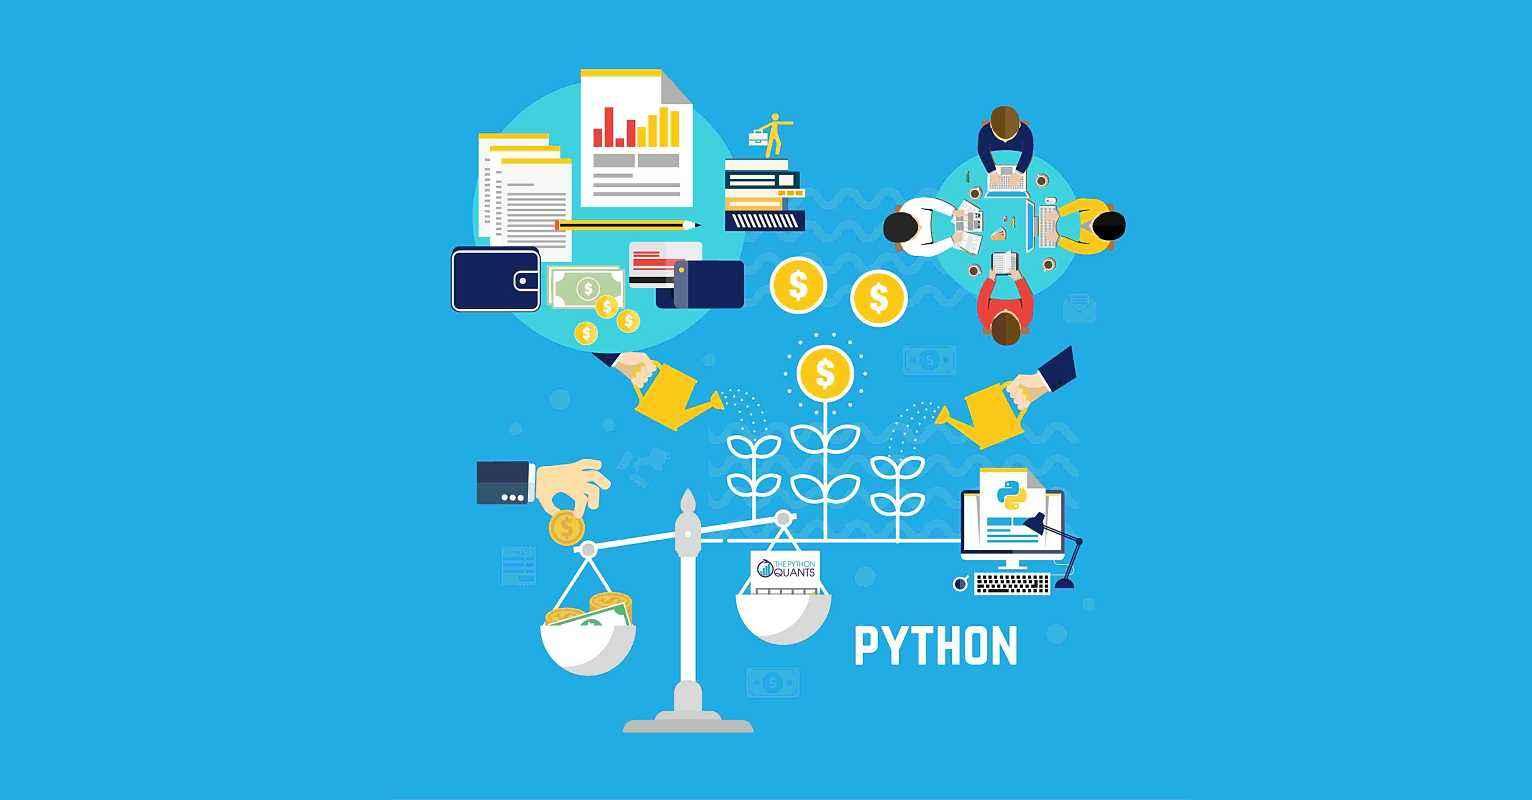 Python是什么?为什么现在越来越多的人选择学习Python语言